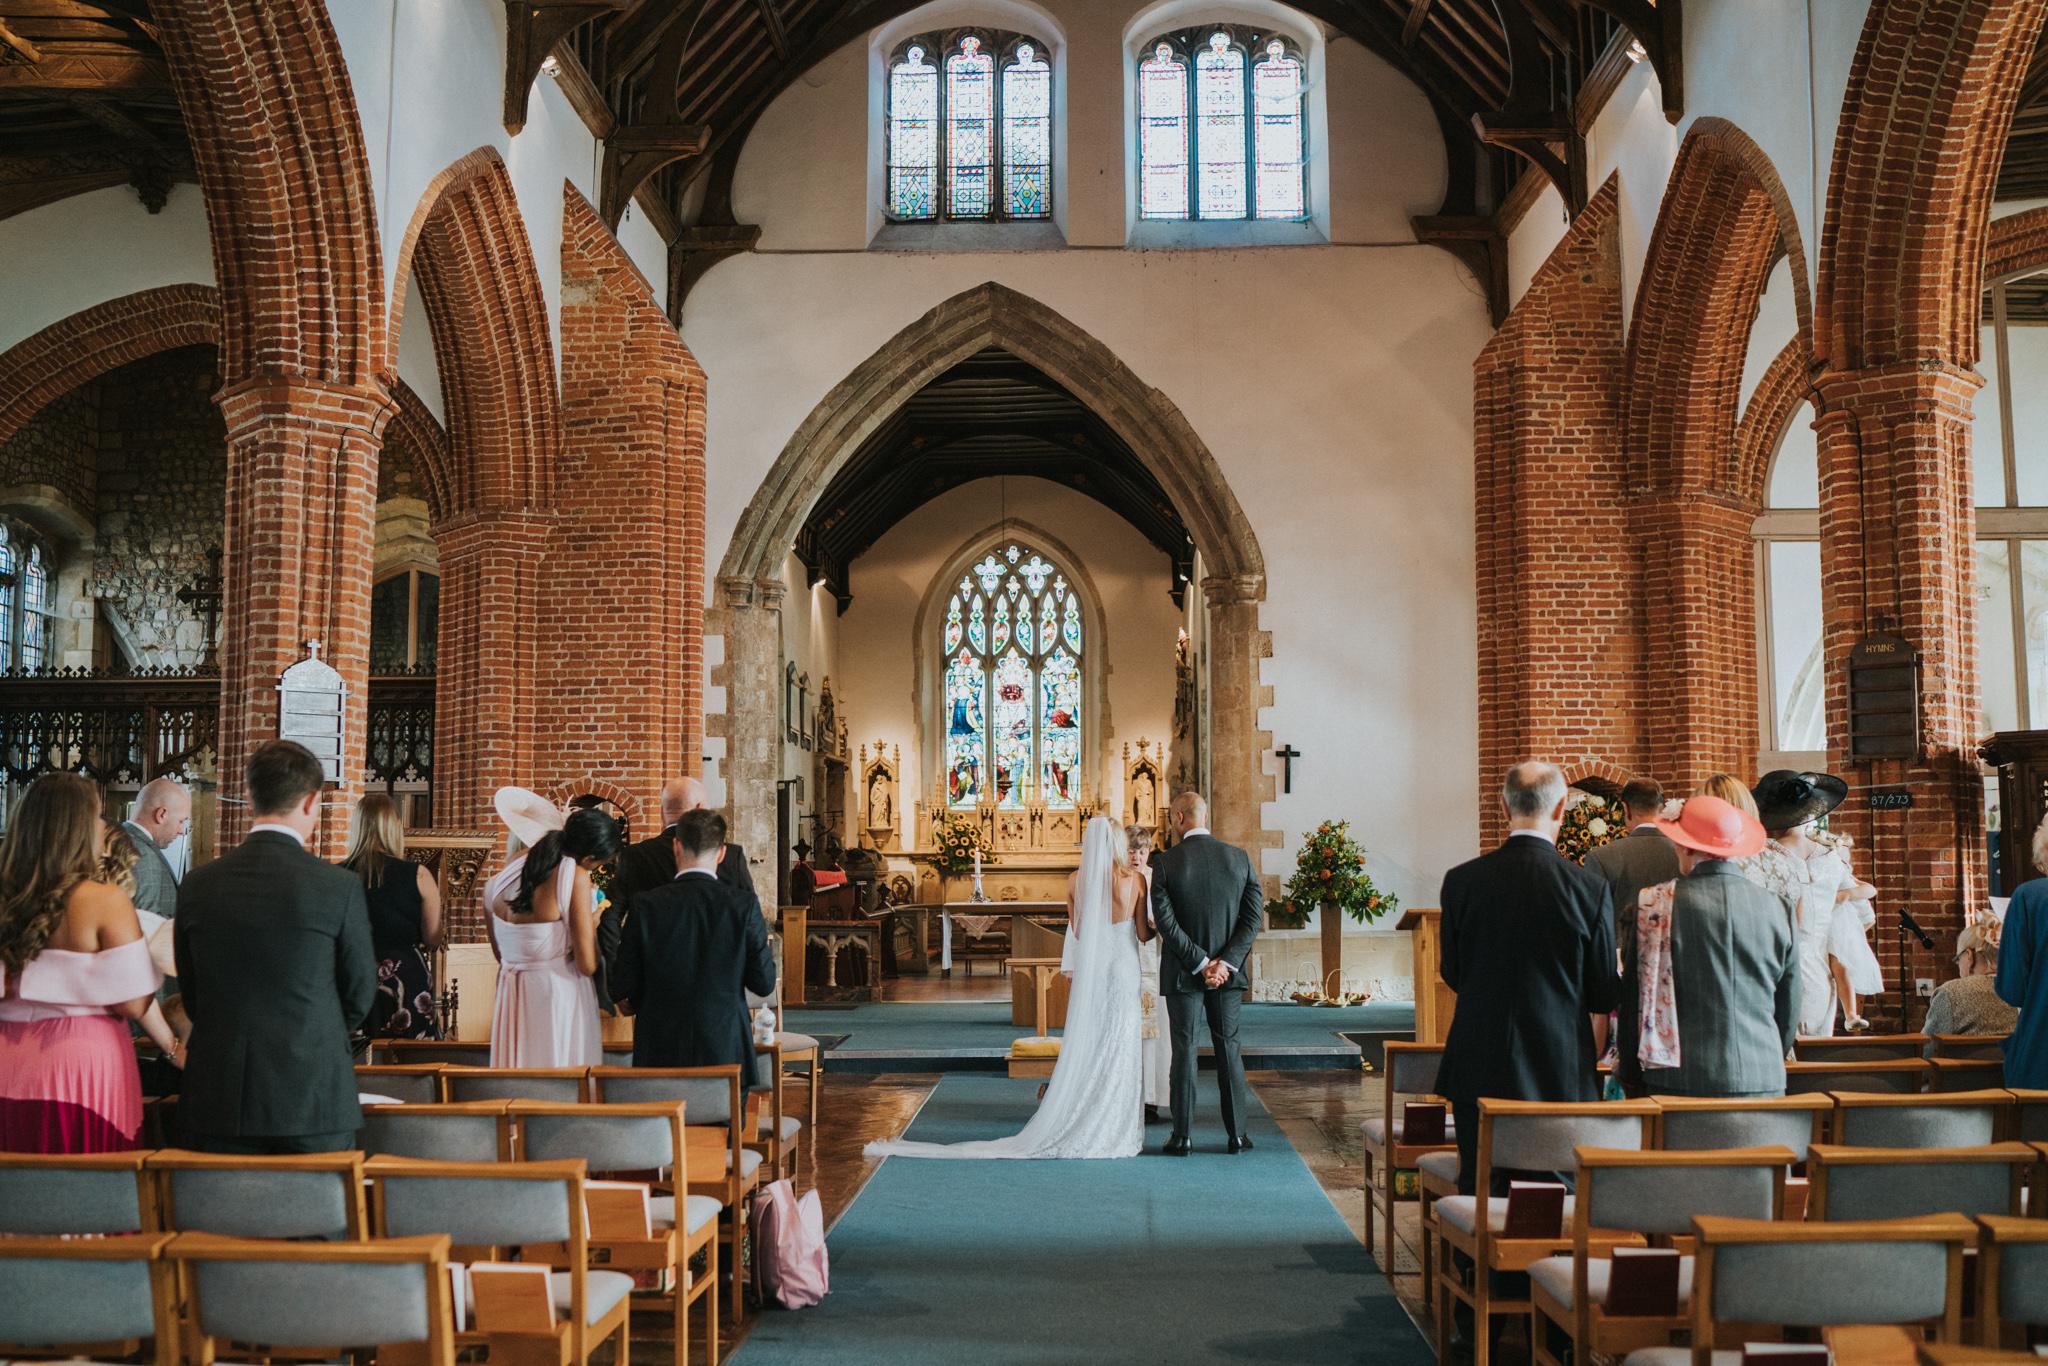 Sarah-Alex-Wivenhoe-House-St-Osyth-Church-Intimate-Wedding-Grace-Elizabeth-Colchester-Essex-Alternative-Wedding-Lifestyle-Photographer (9 of 11).jpg